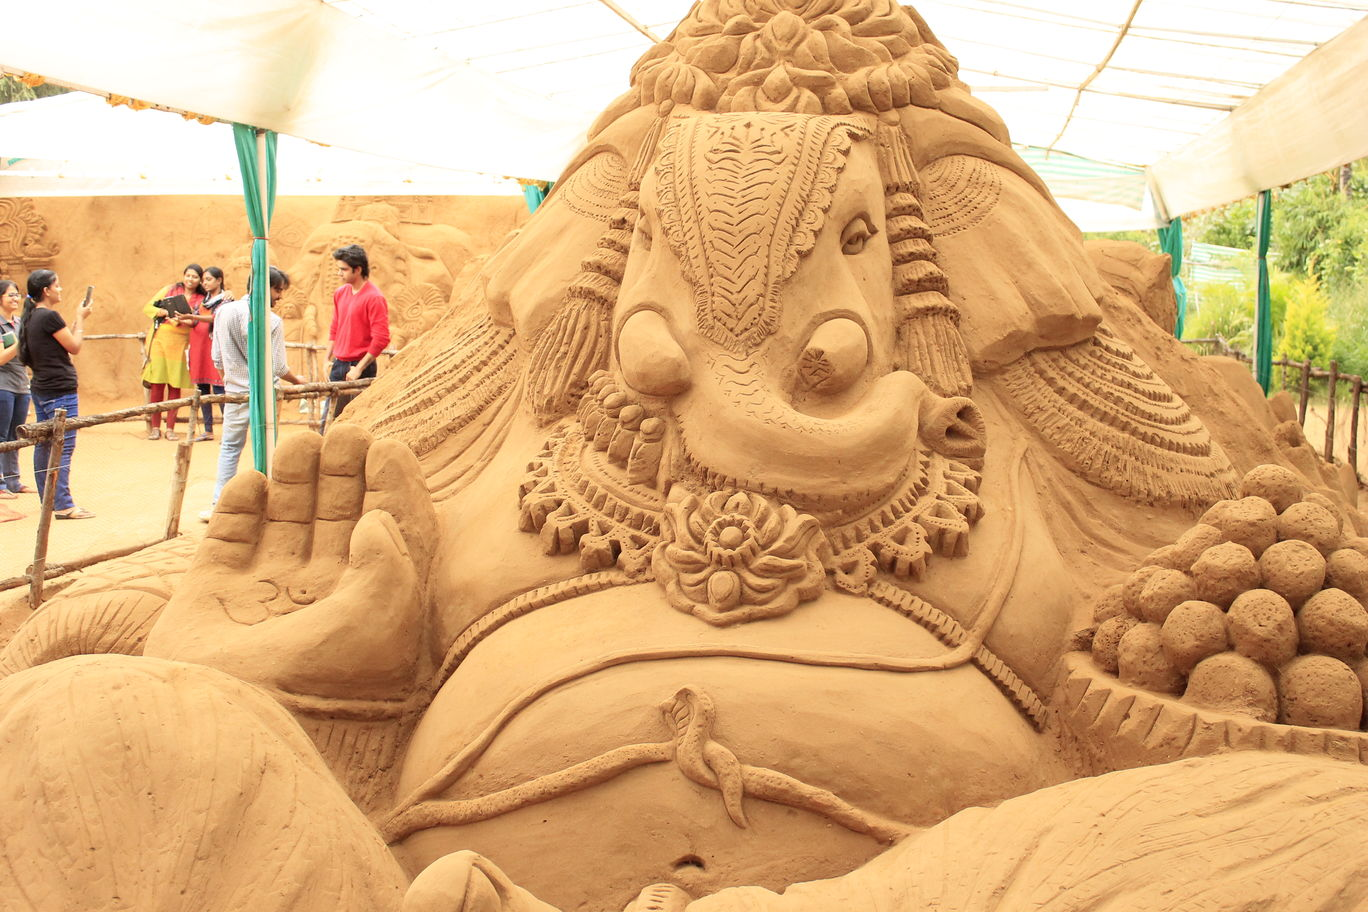 Photo of Mysuru Sand Sculpture Museum By Arijit Mullick